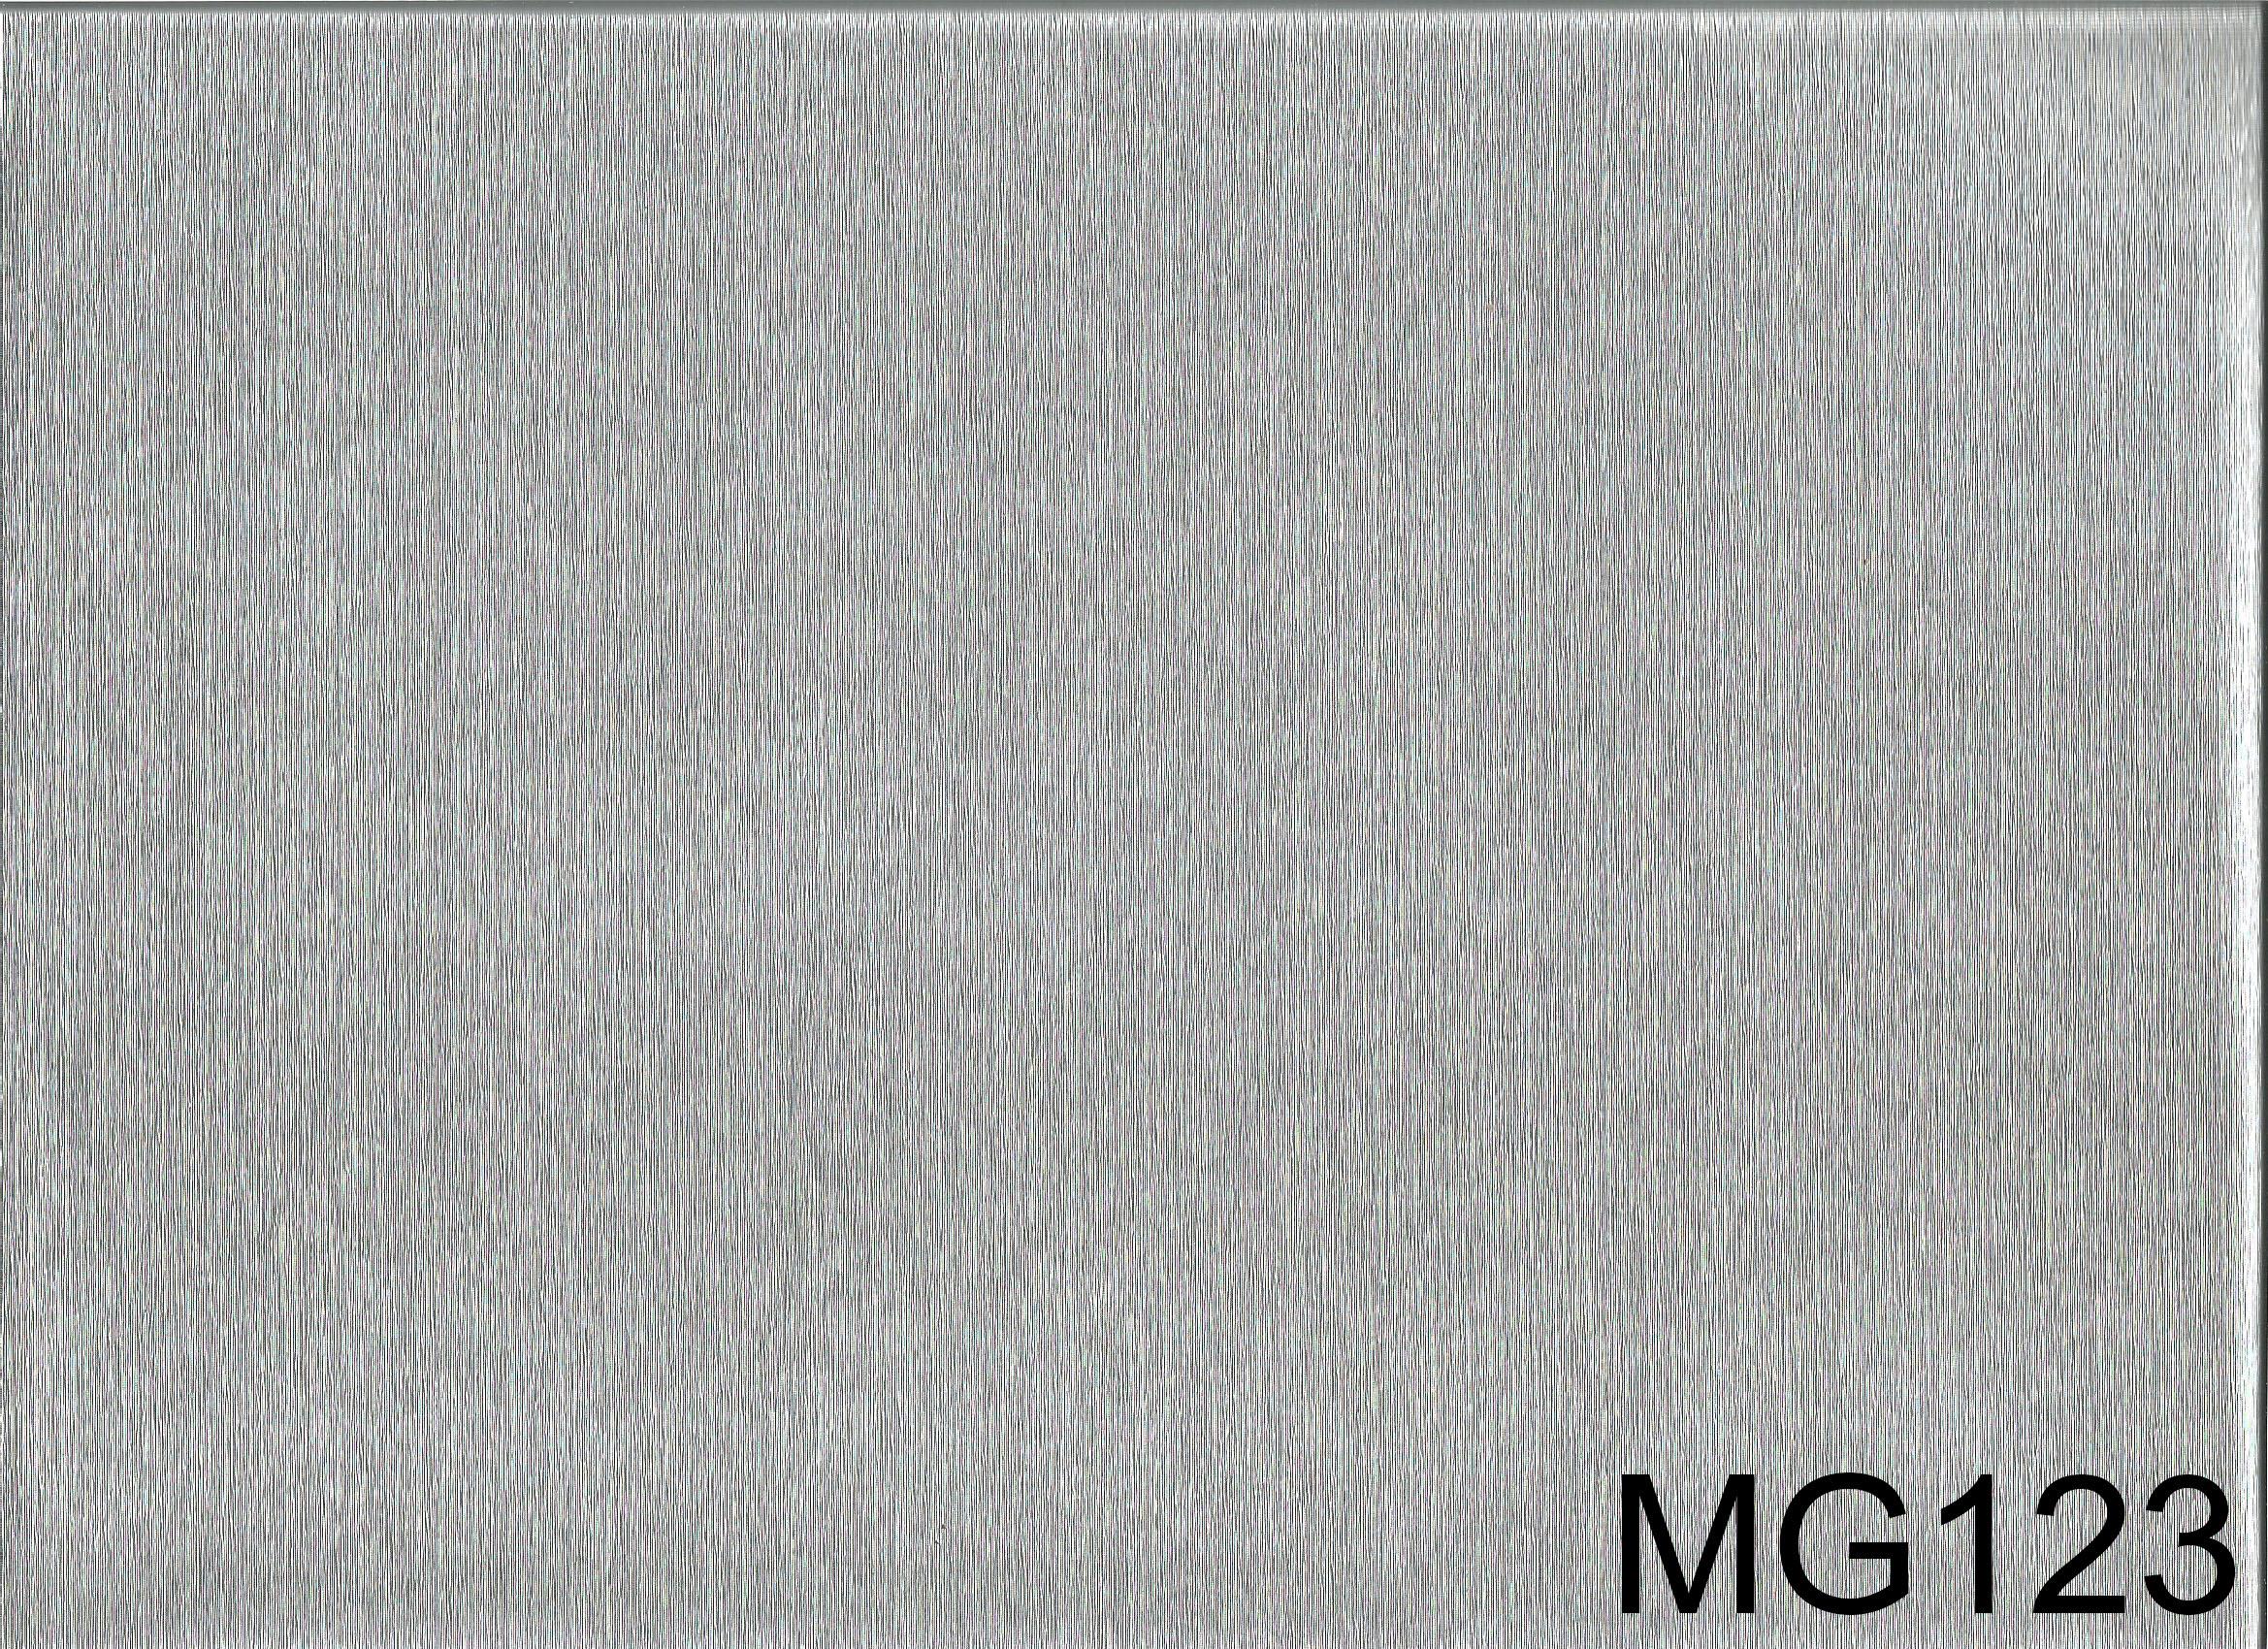 MG123